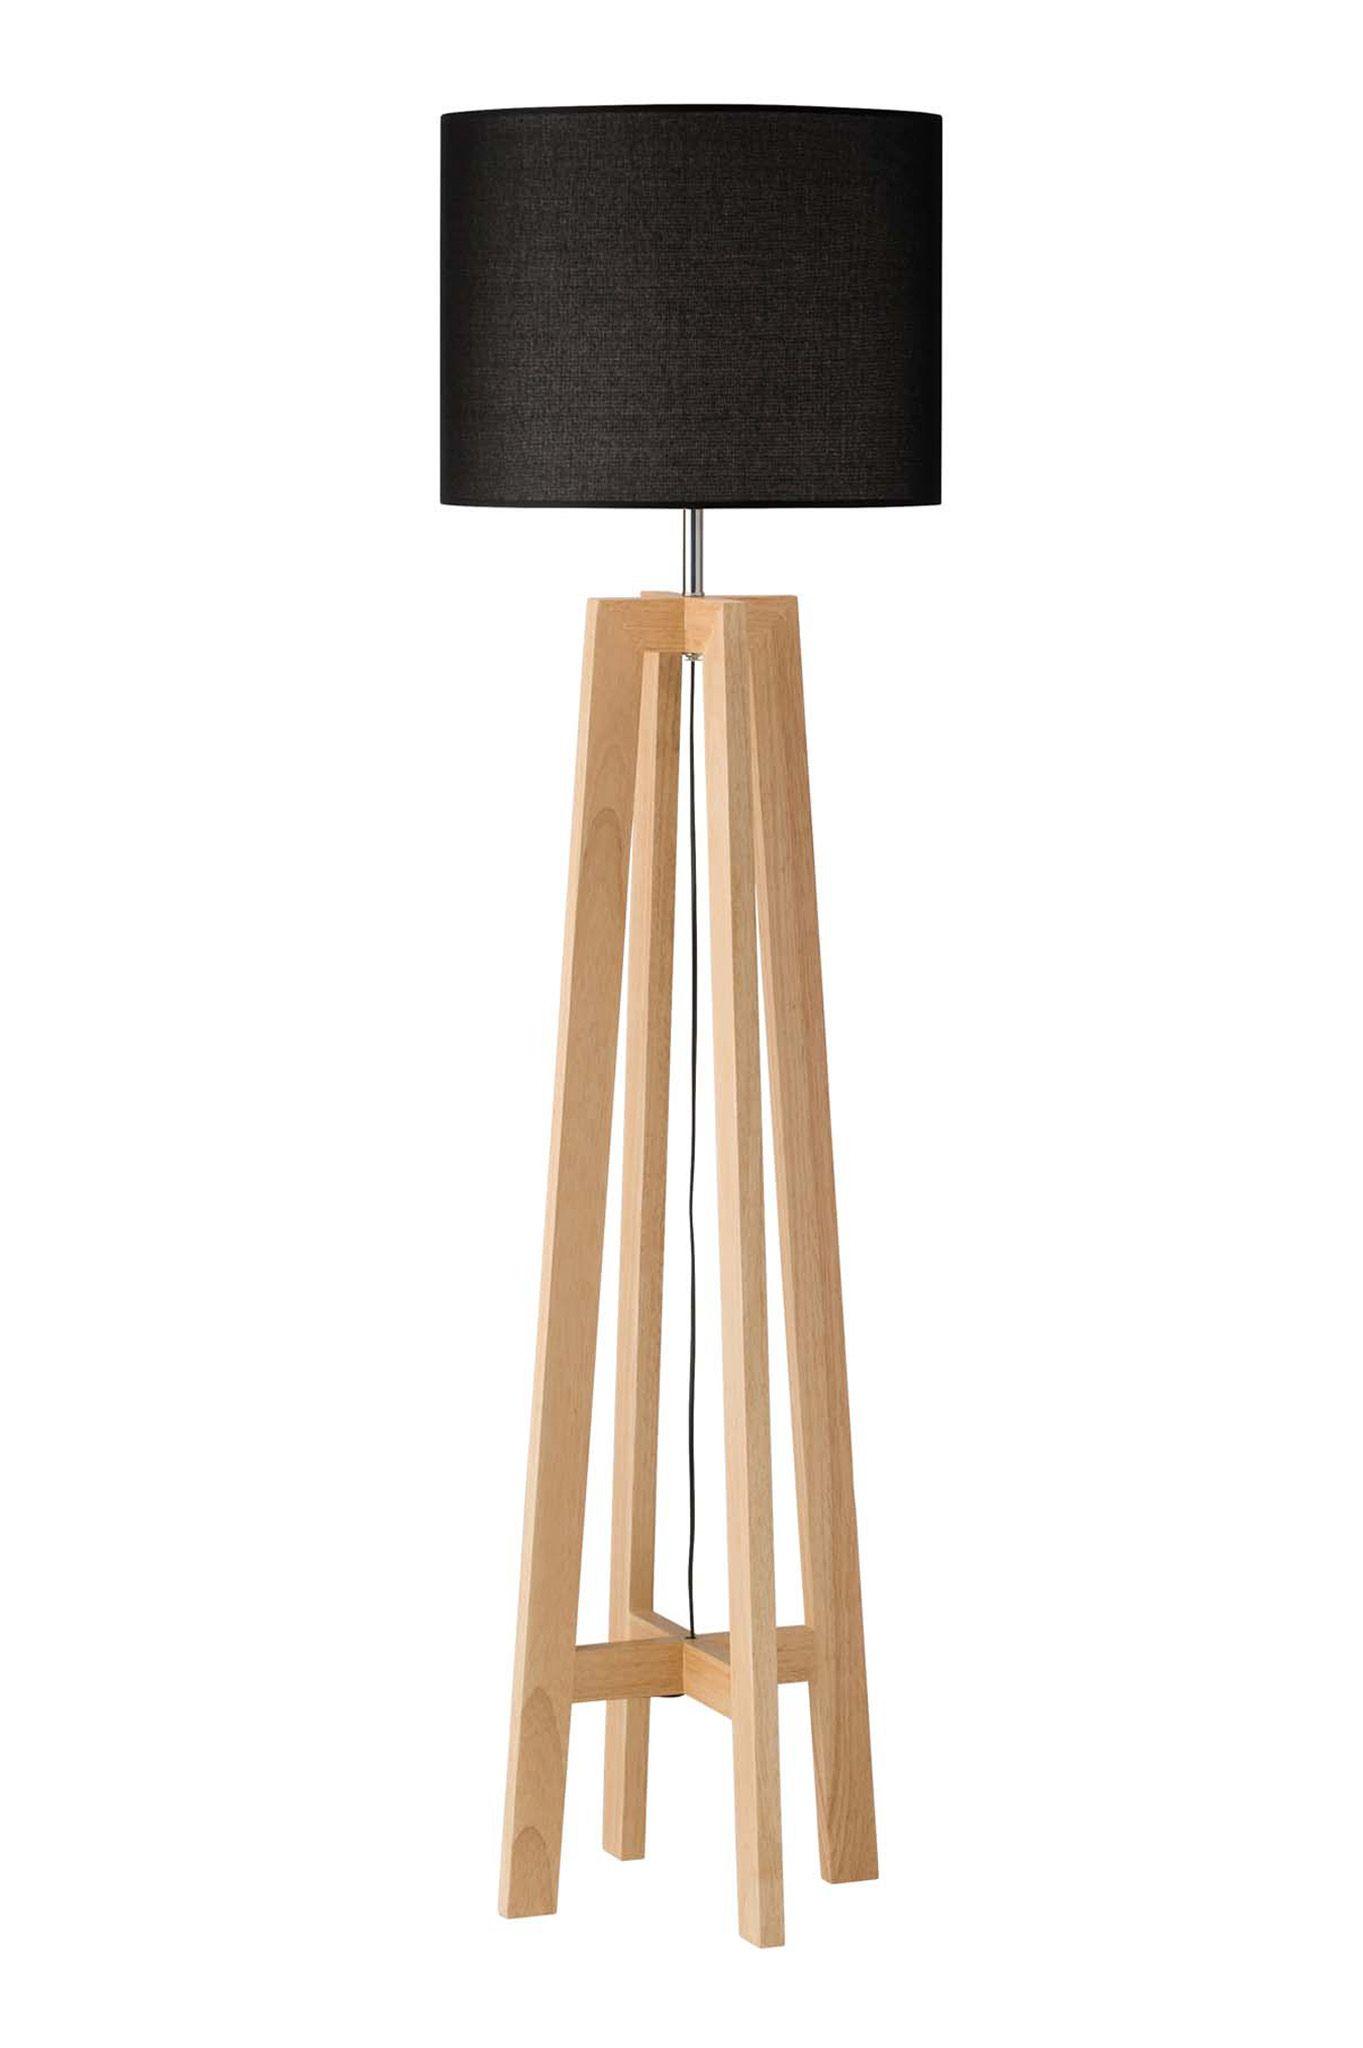 905 Chase Ash Timber Floor Lamp   Trending    Scandi Style ...